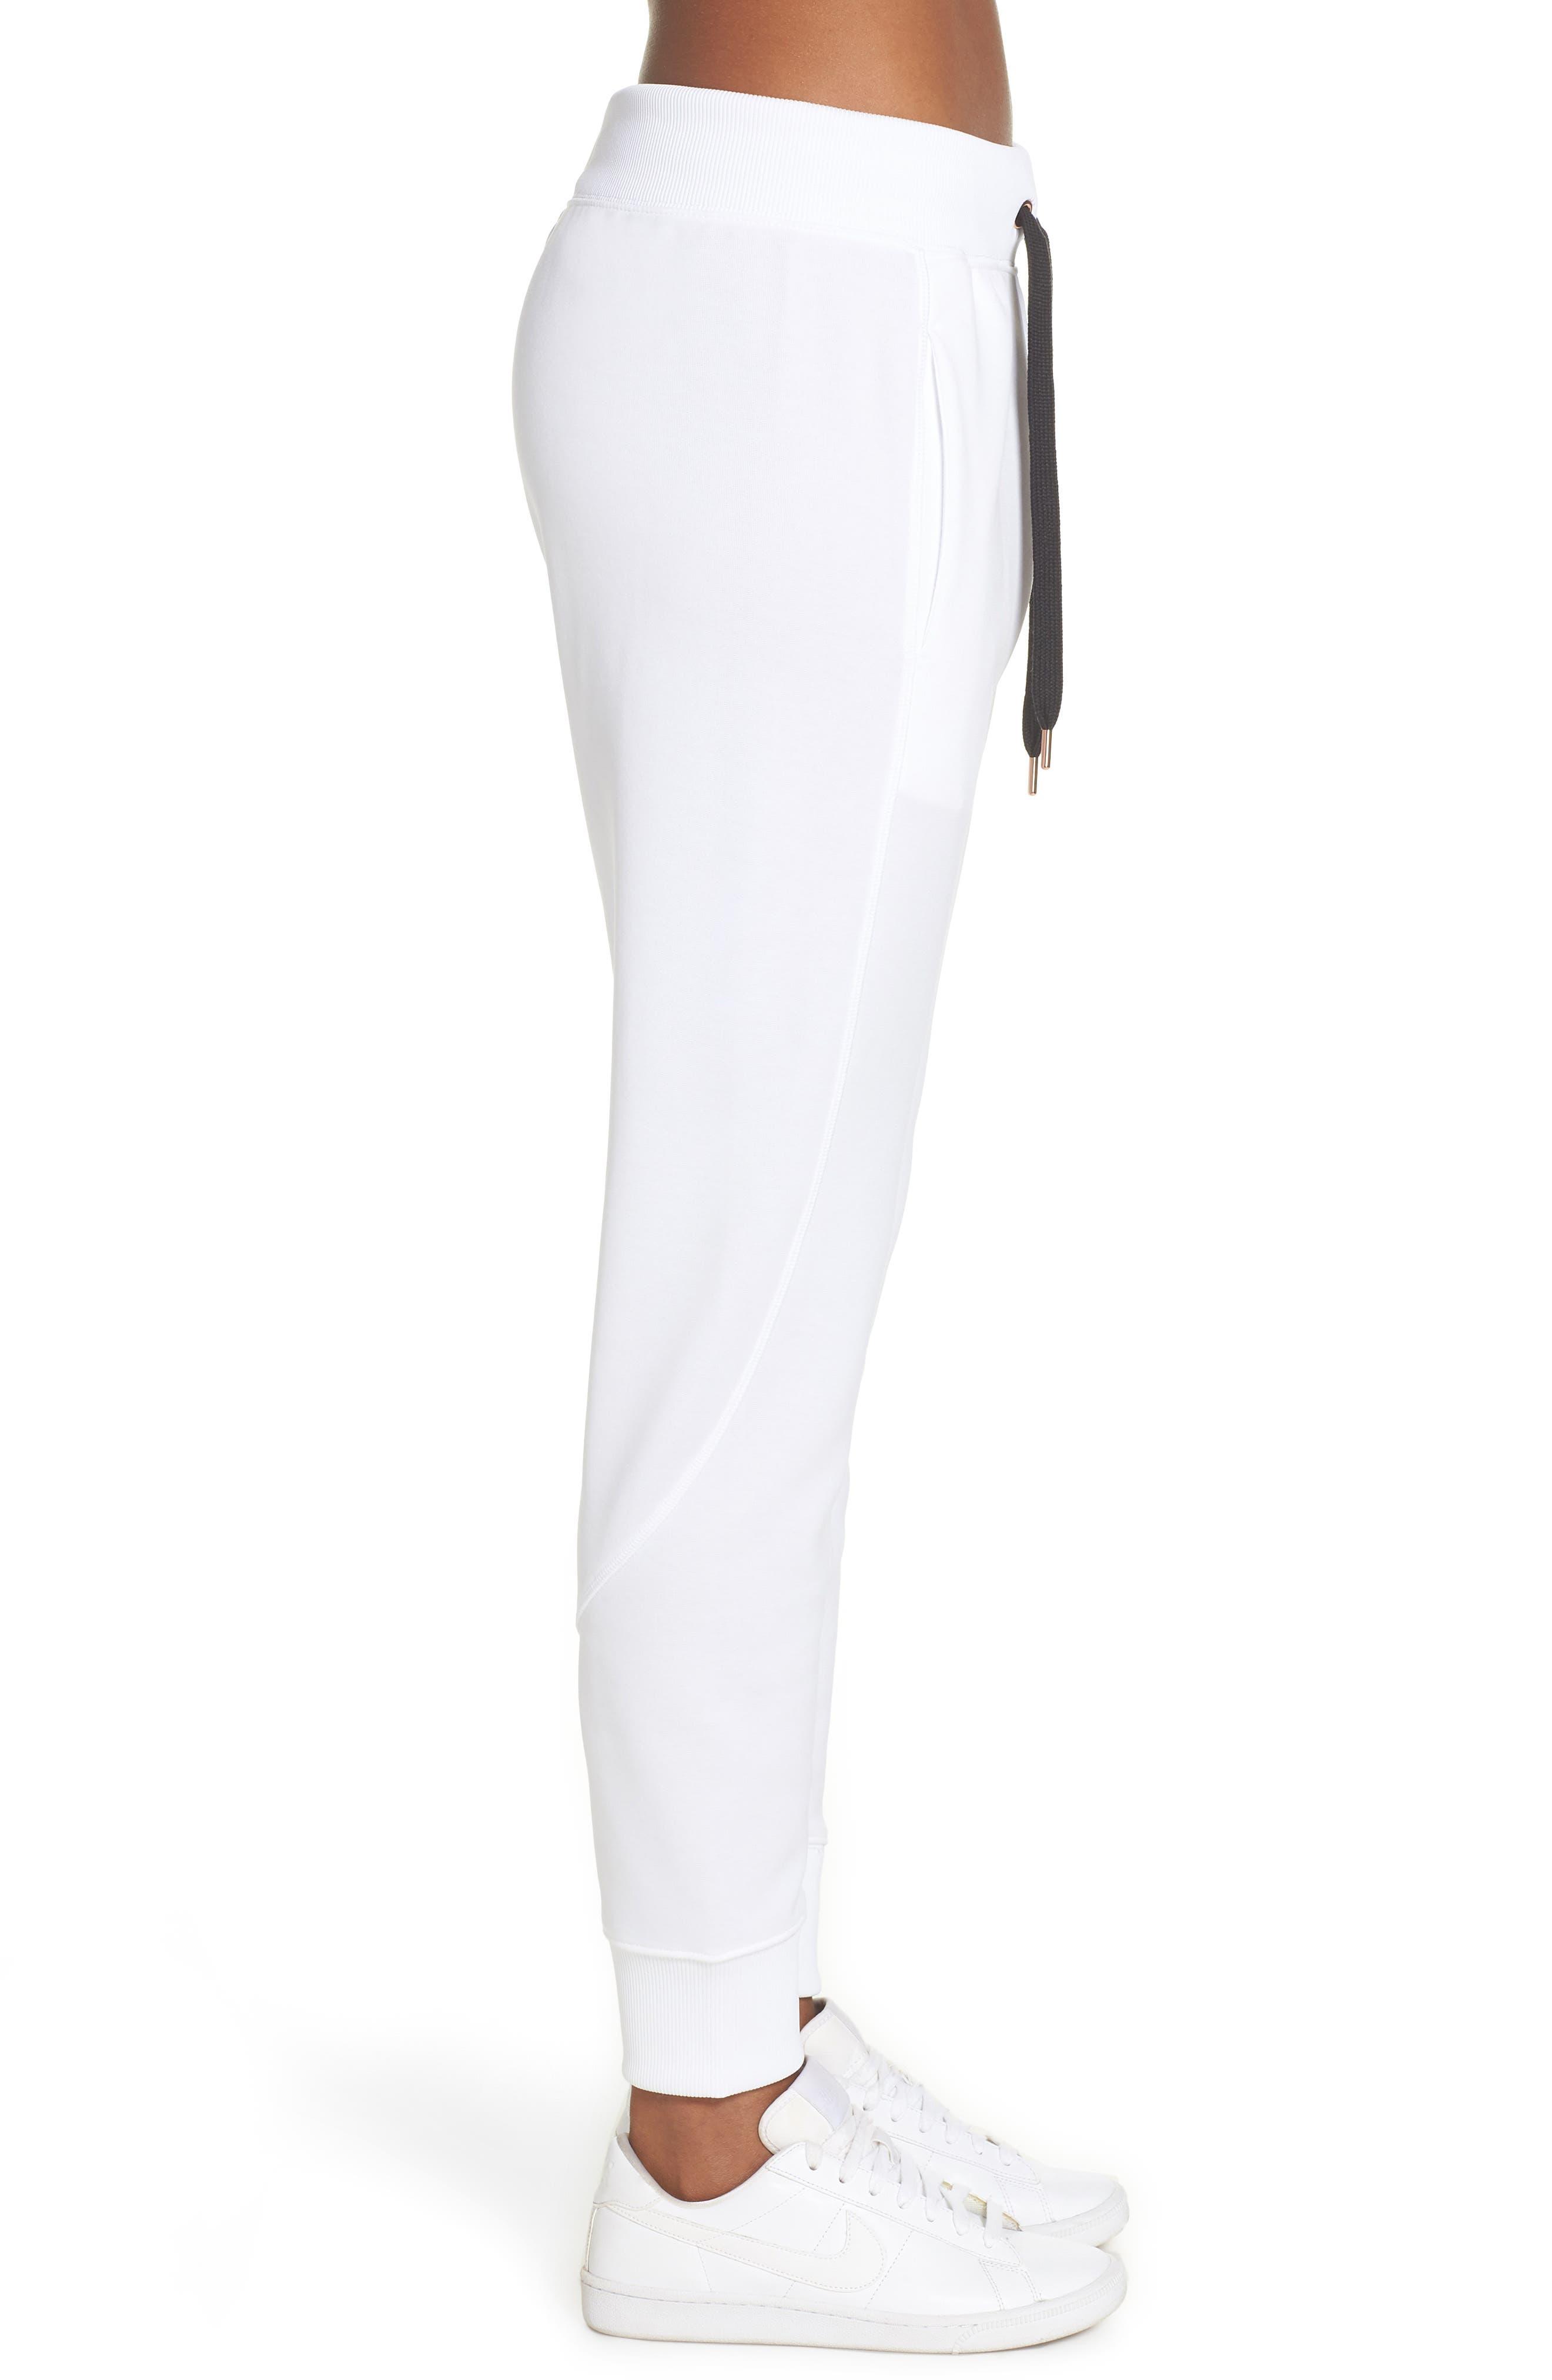 Sportswear Air Jogger Pants,                             Alternate thumbnail 3, color,                             WHITE/ ROSE GOLD/ BLACK